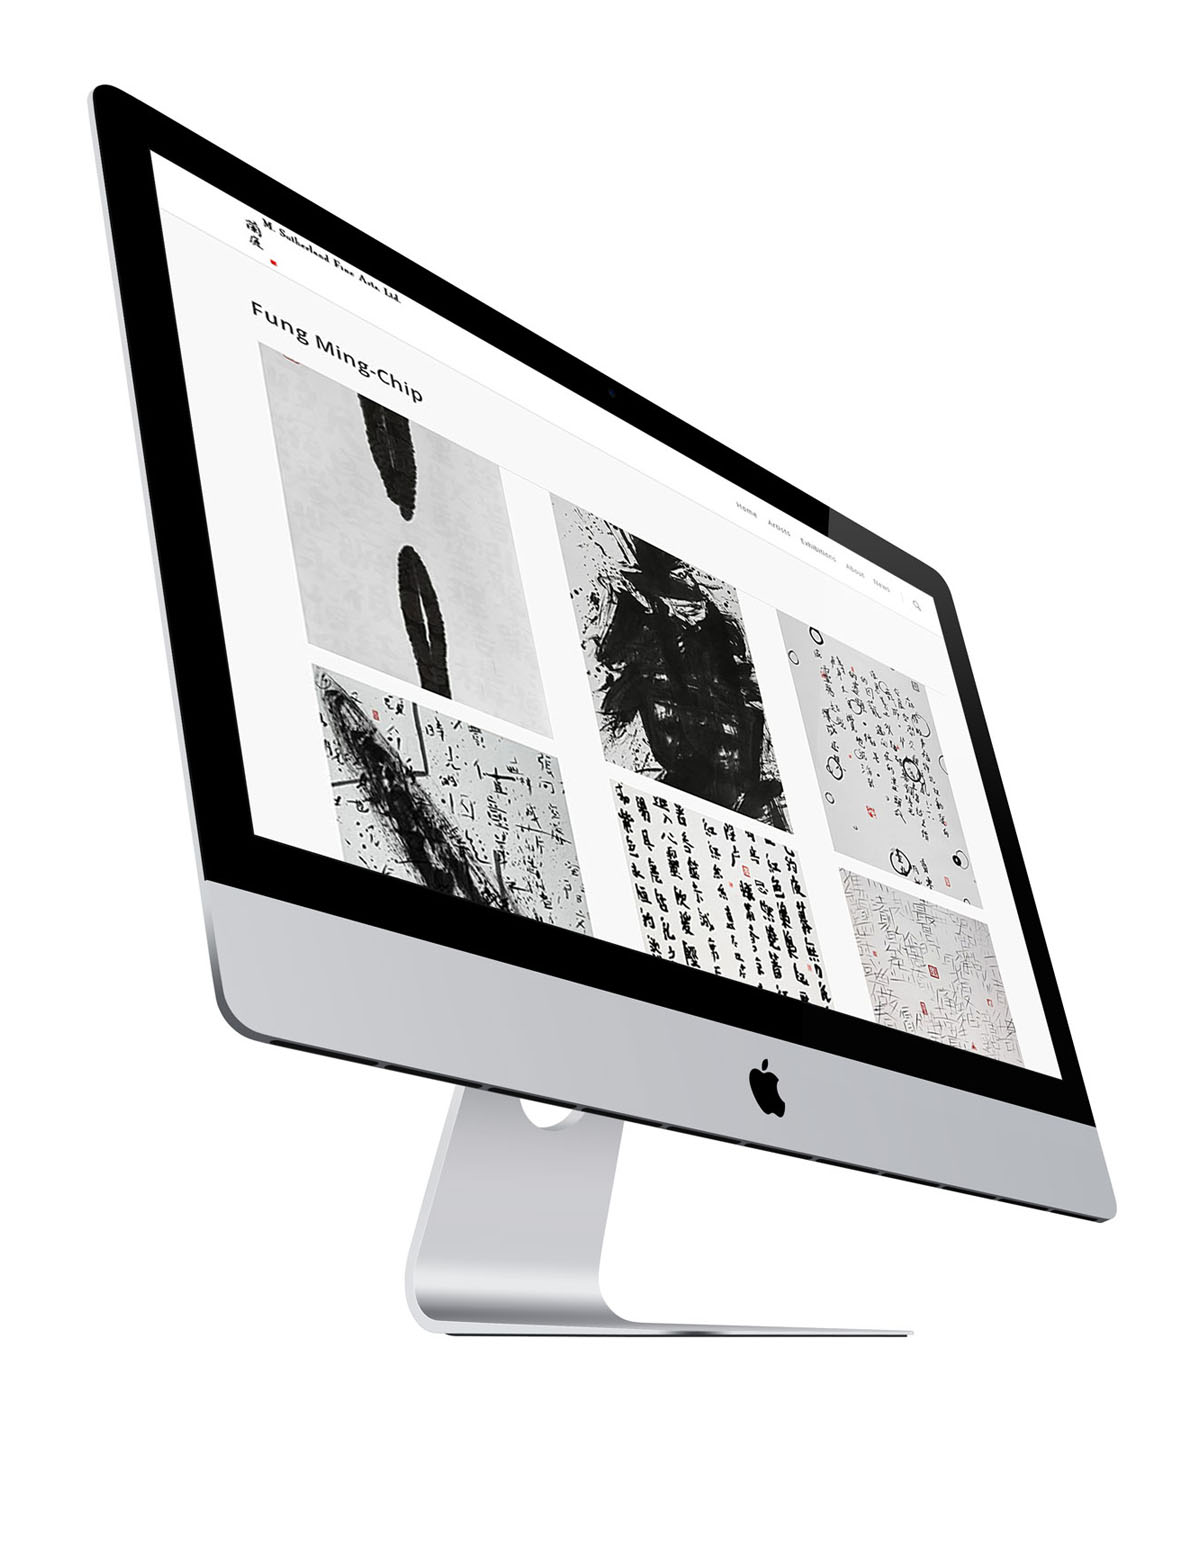 Site launch, M. Sutherland Fine Art